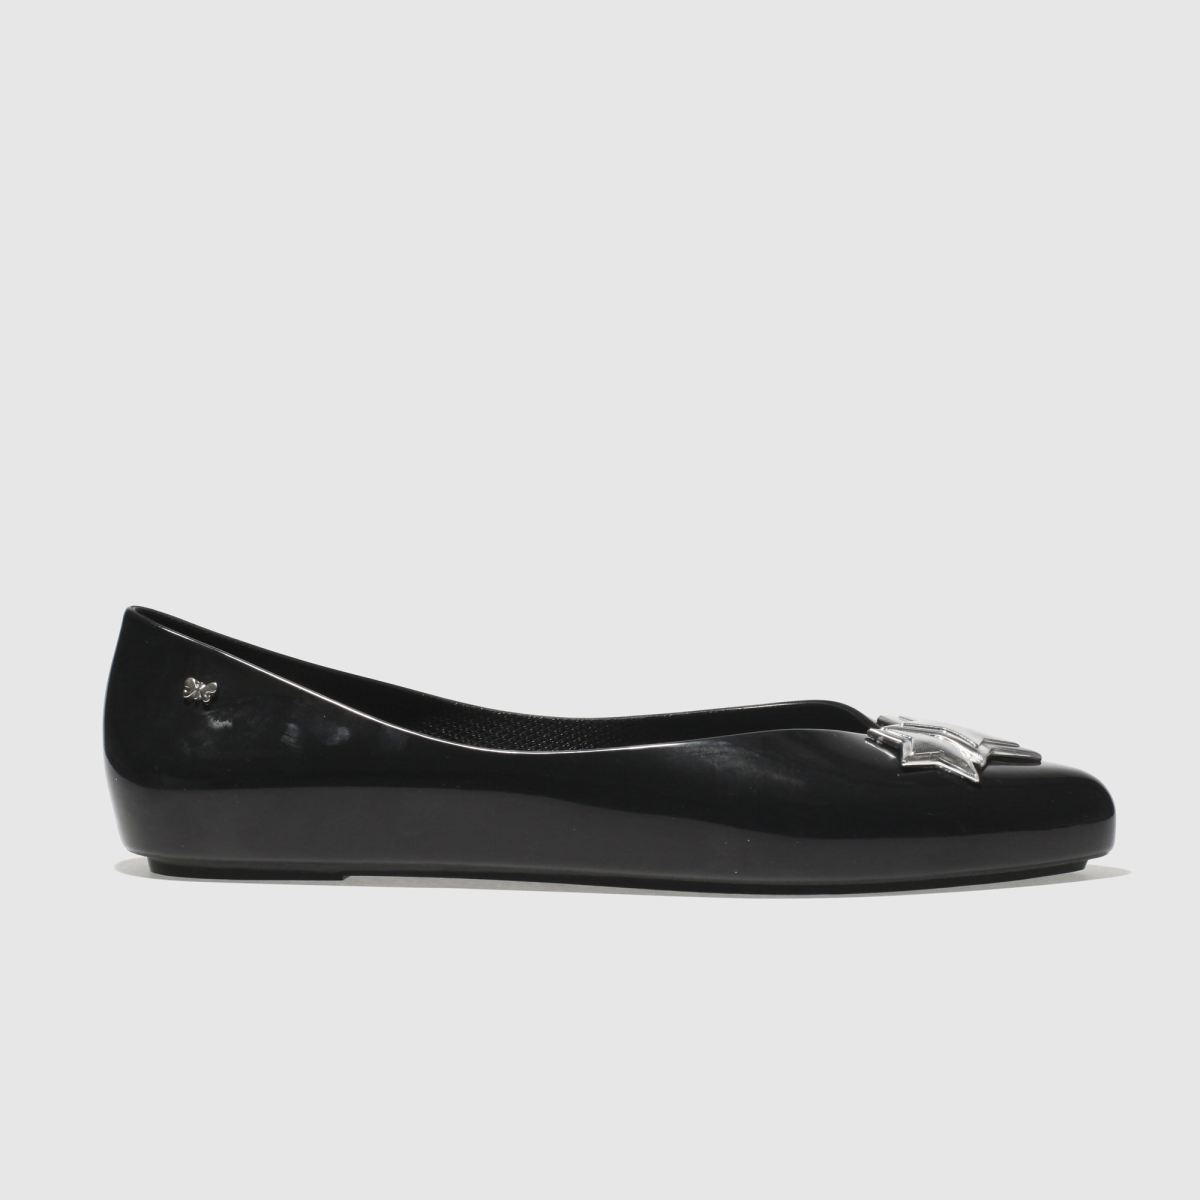 Zaxy Zaxy Black & Silver Chic Flat Shoes